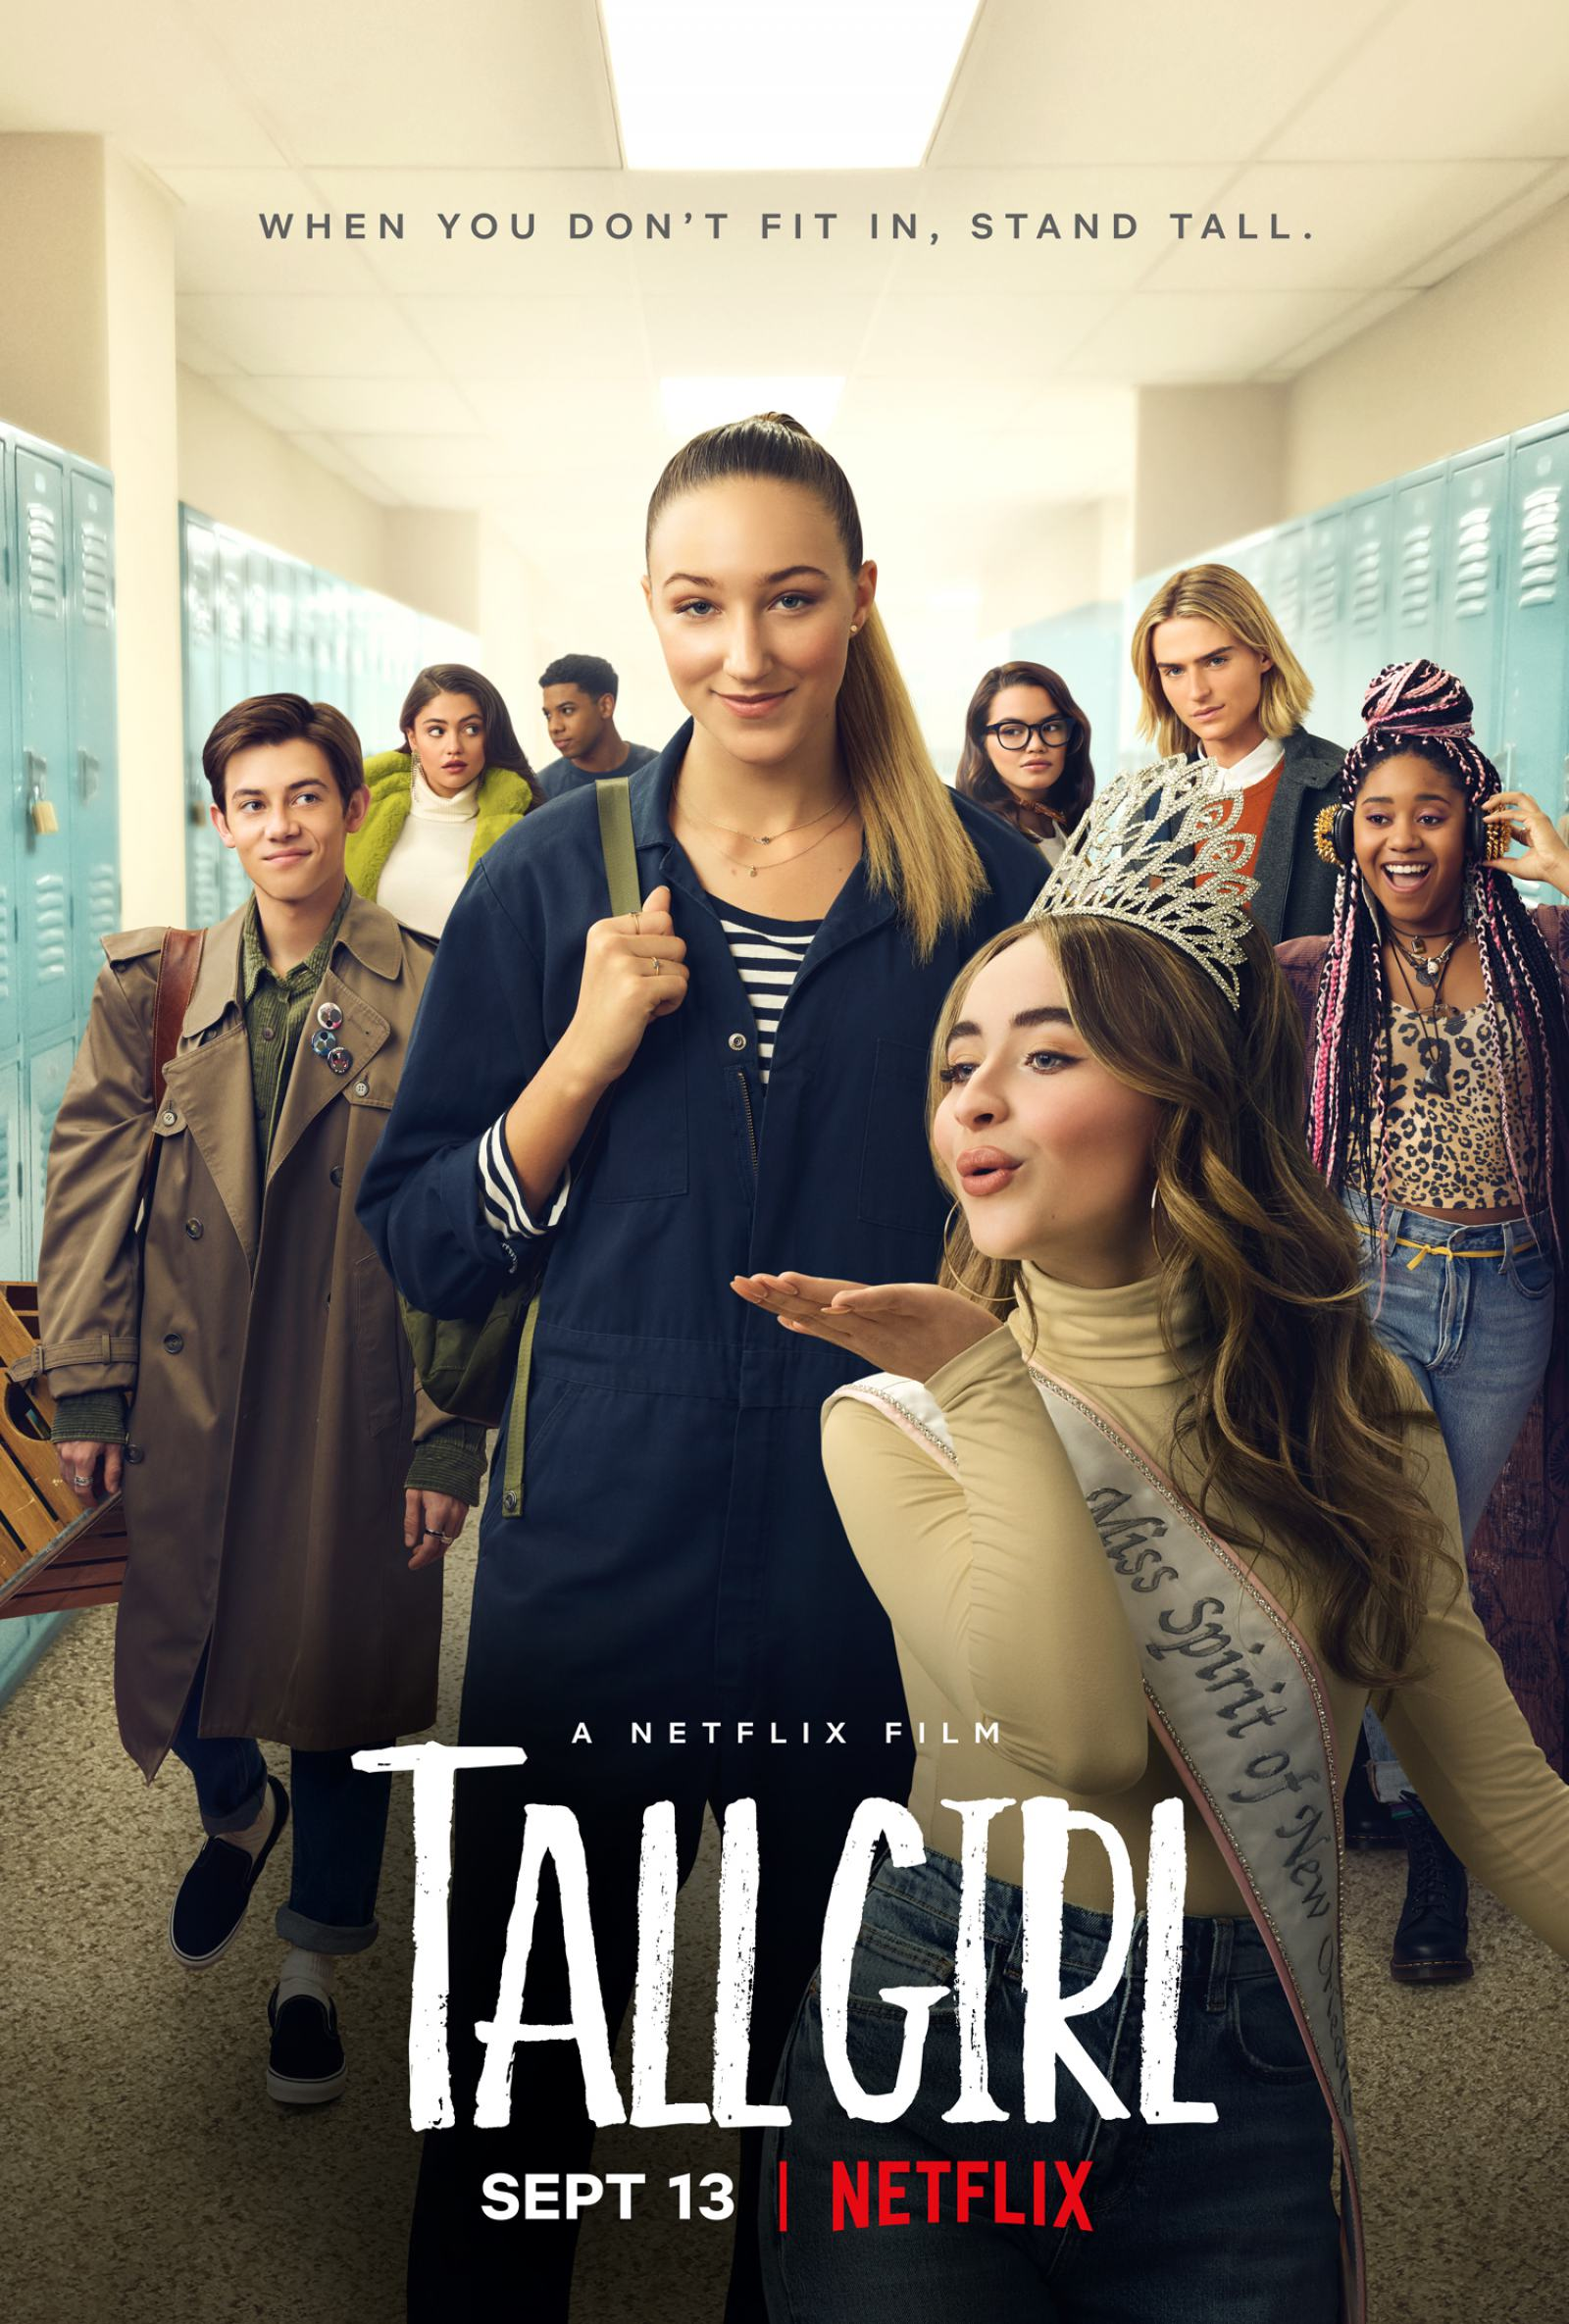 Tall Girl Poster #1